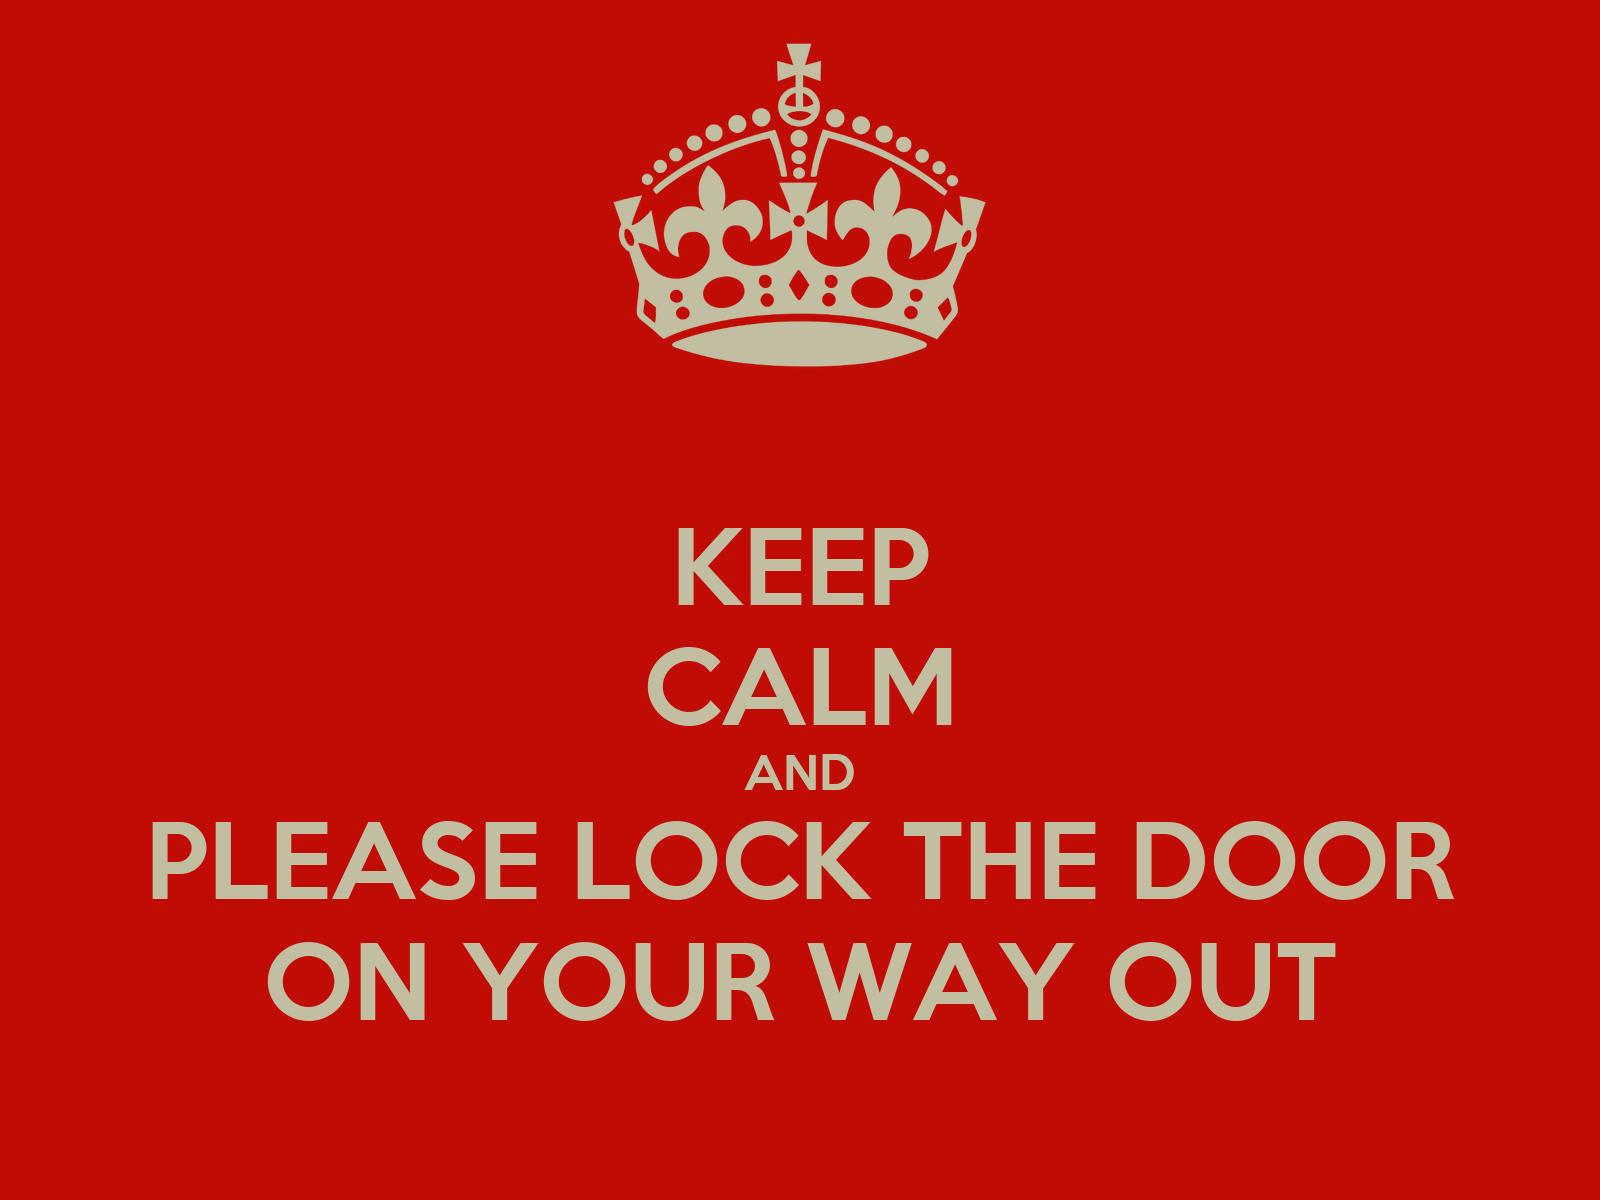 please lock door. KEEP CALM AND PLEASE LOCK THE DOOR ON YOUR WAY OUT Poster | Jodi Keep Calm-o-Matic Please Lock Door O